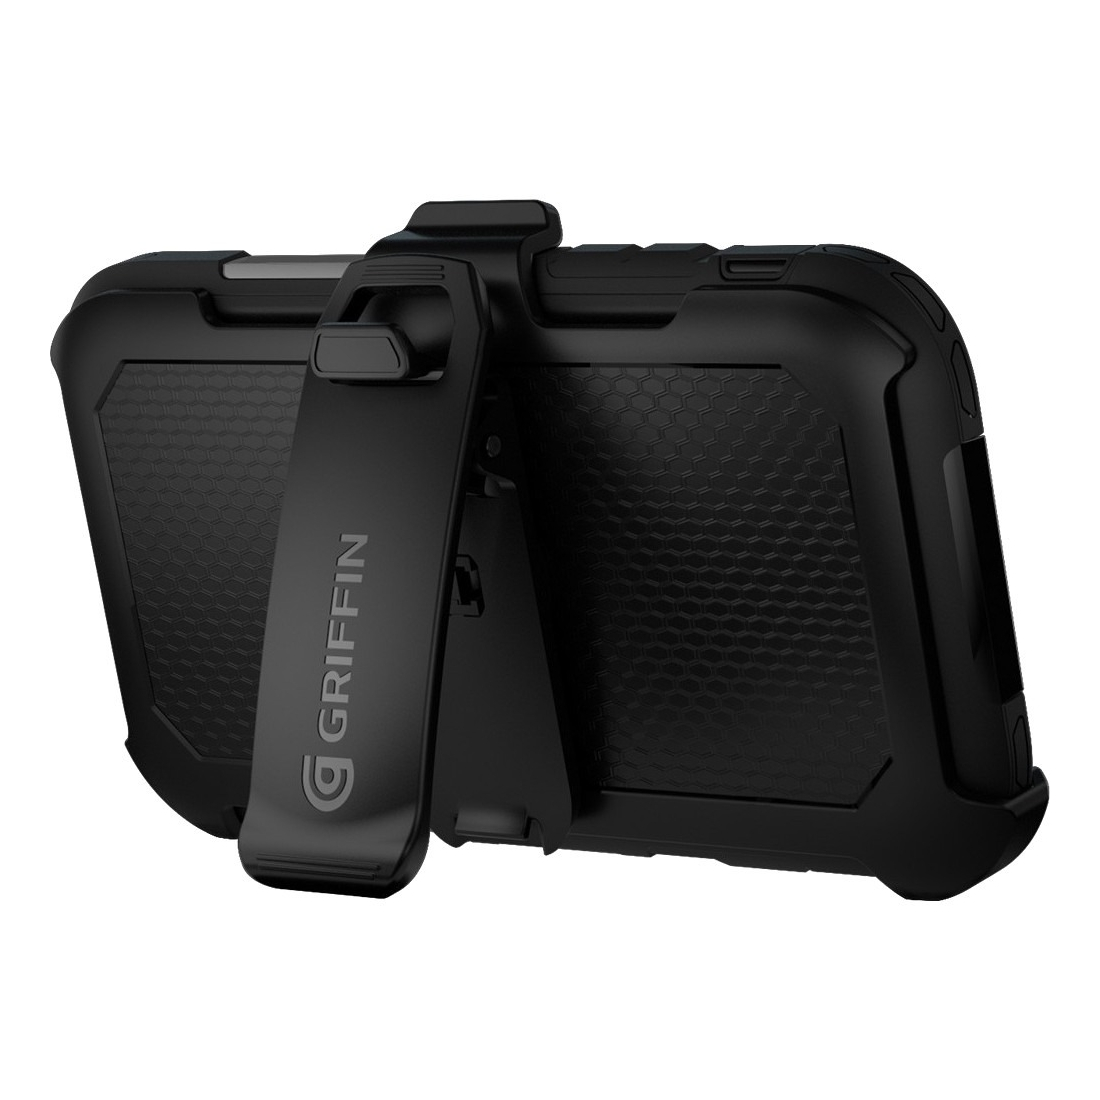 Griffin Survivor Summit Carrying Case For Iphone 6 Plus, Iphone 6s Plus - Clear, Black - Drop Resistant, Splash Resistant, Dirt Proof, Sand Proof, Rain Proof, Impact Resistant, Shatter (gb41618)